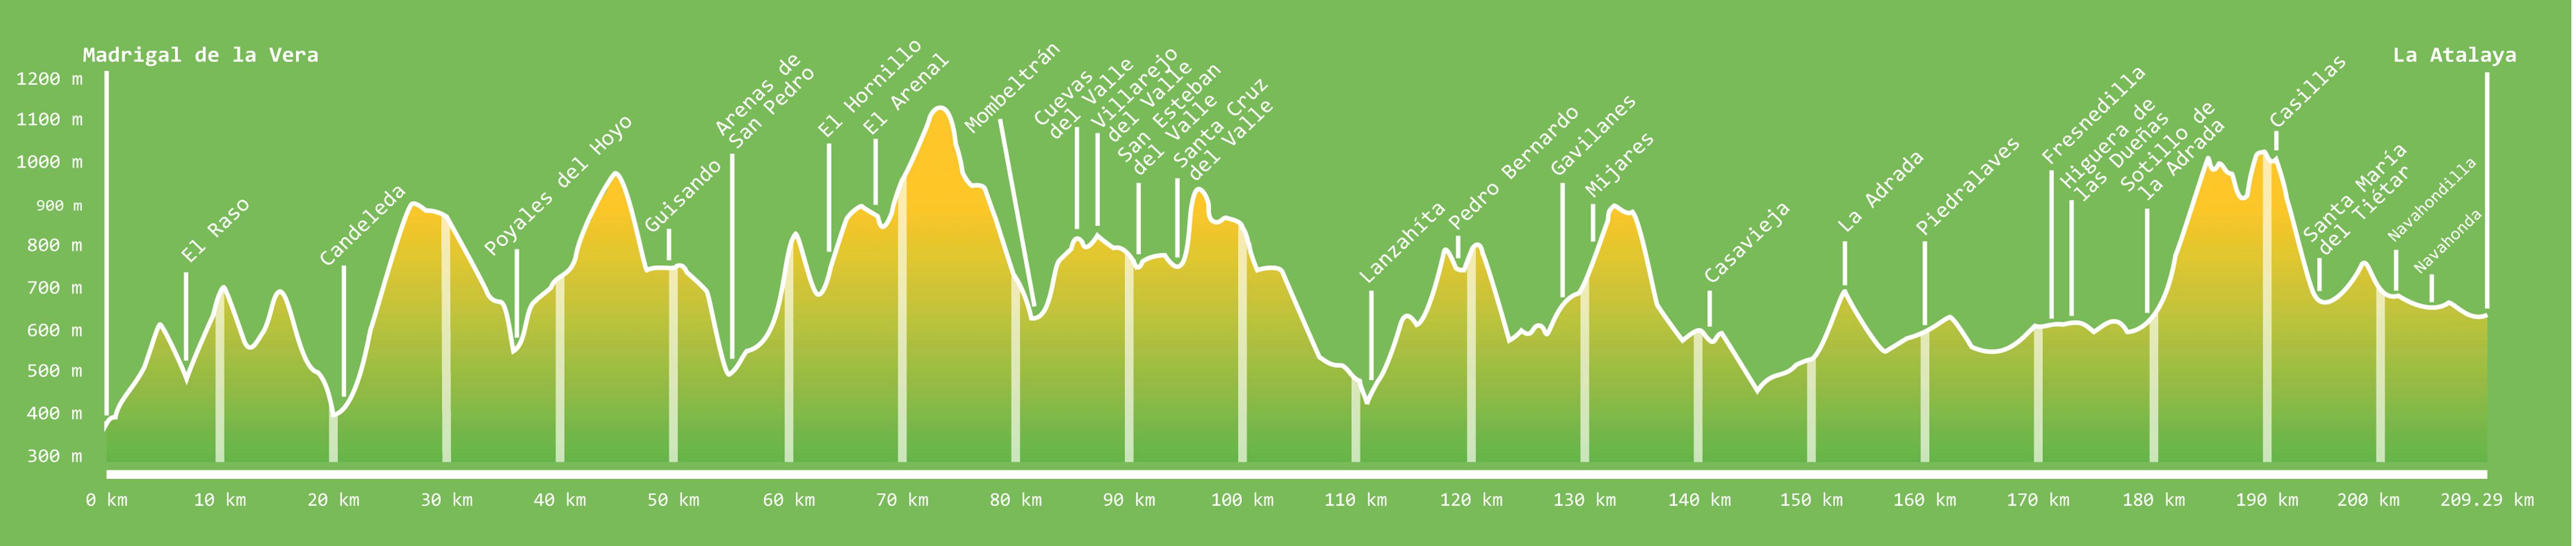 Perfil del Sendero GR 180 por el Valle del Tiétar - TiétarTeVe